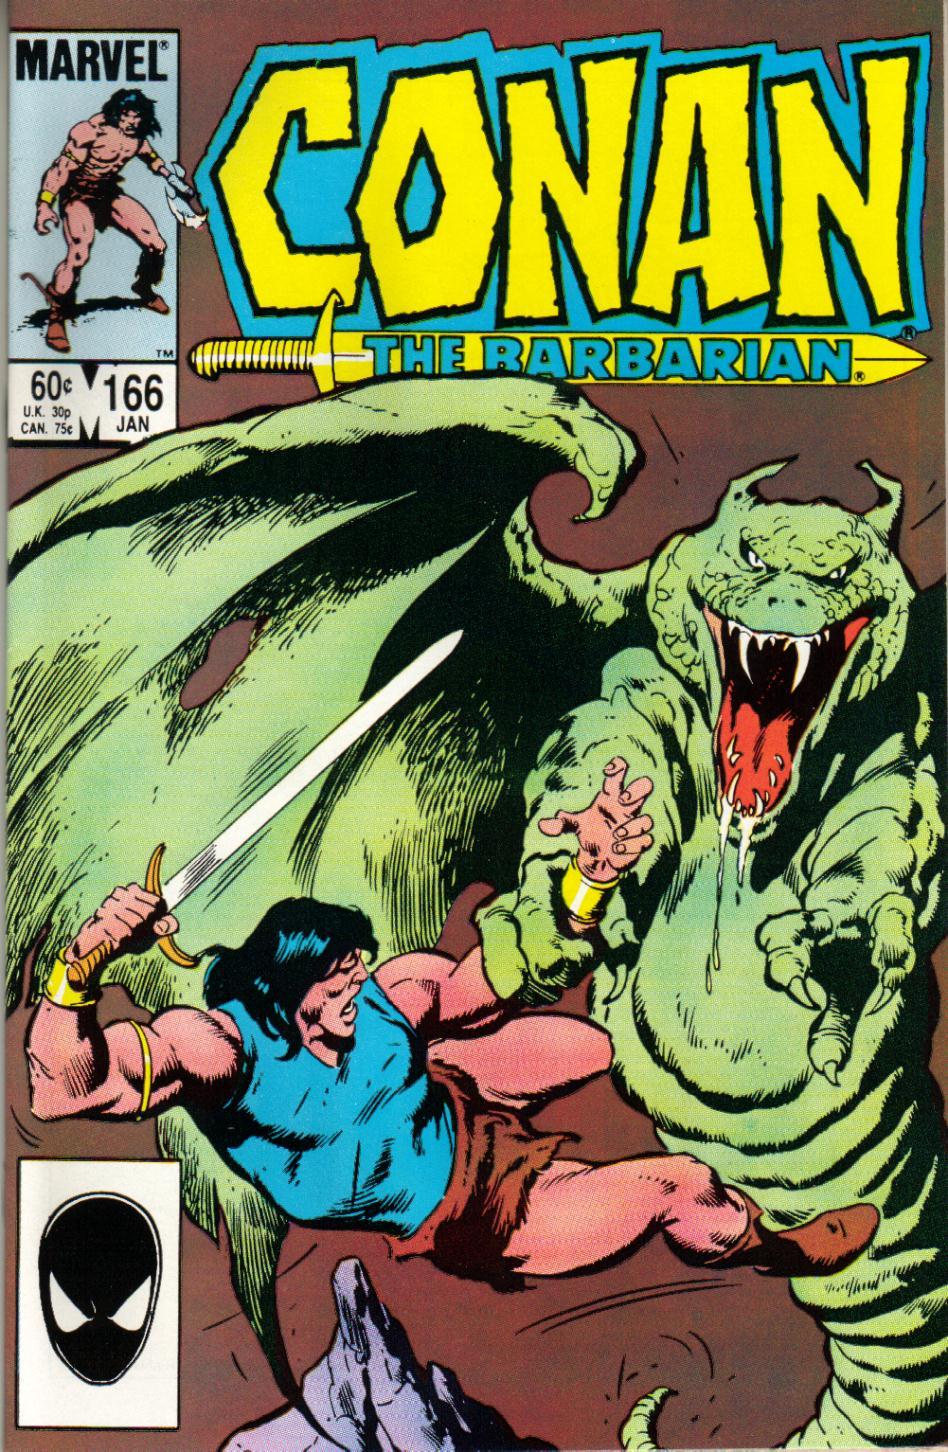 Conan the Barbarian 166